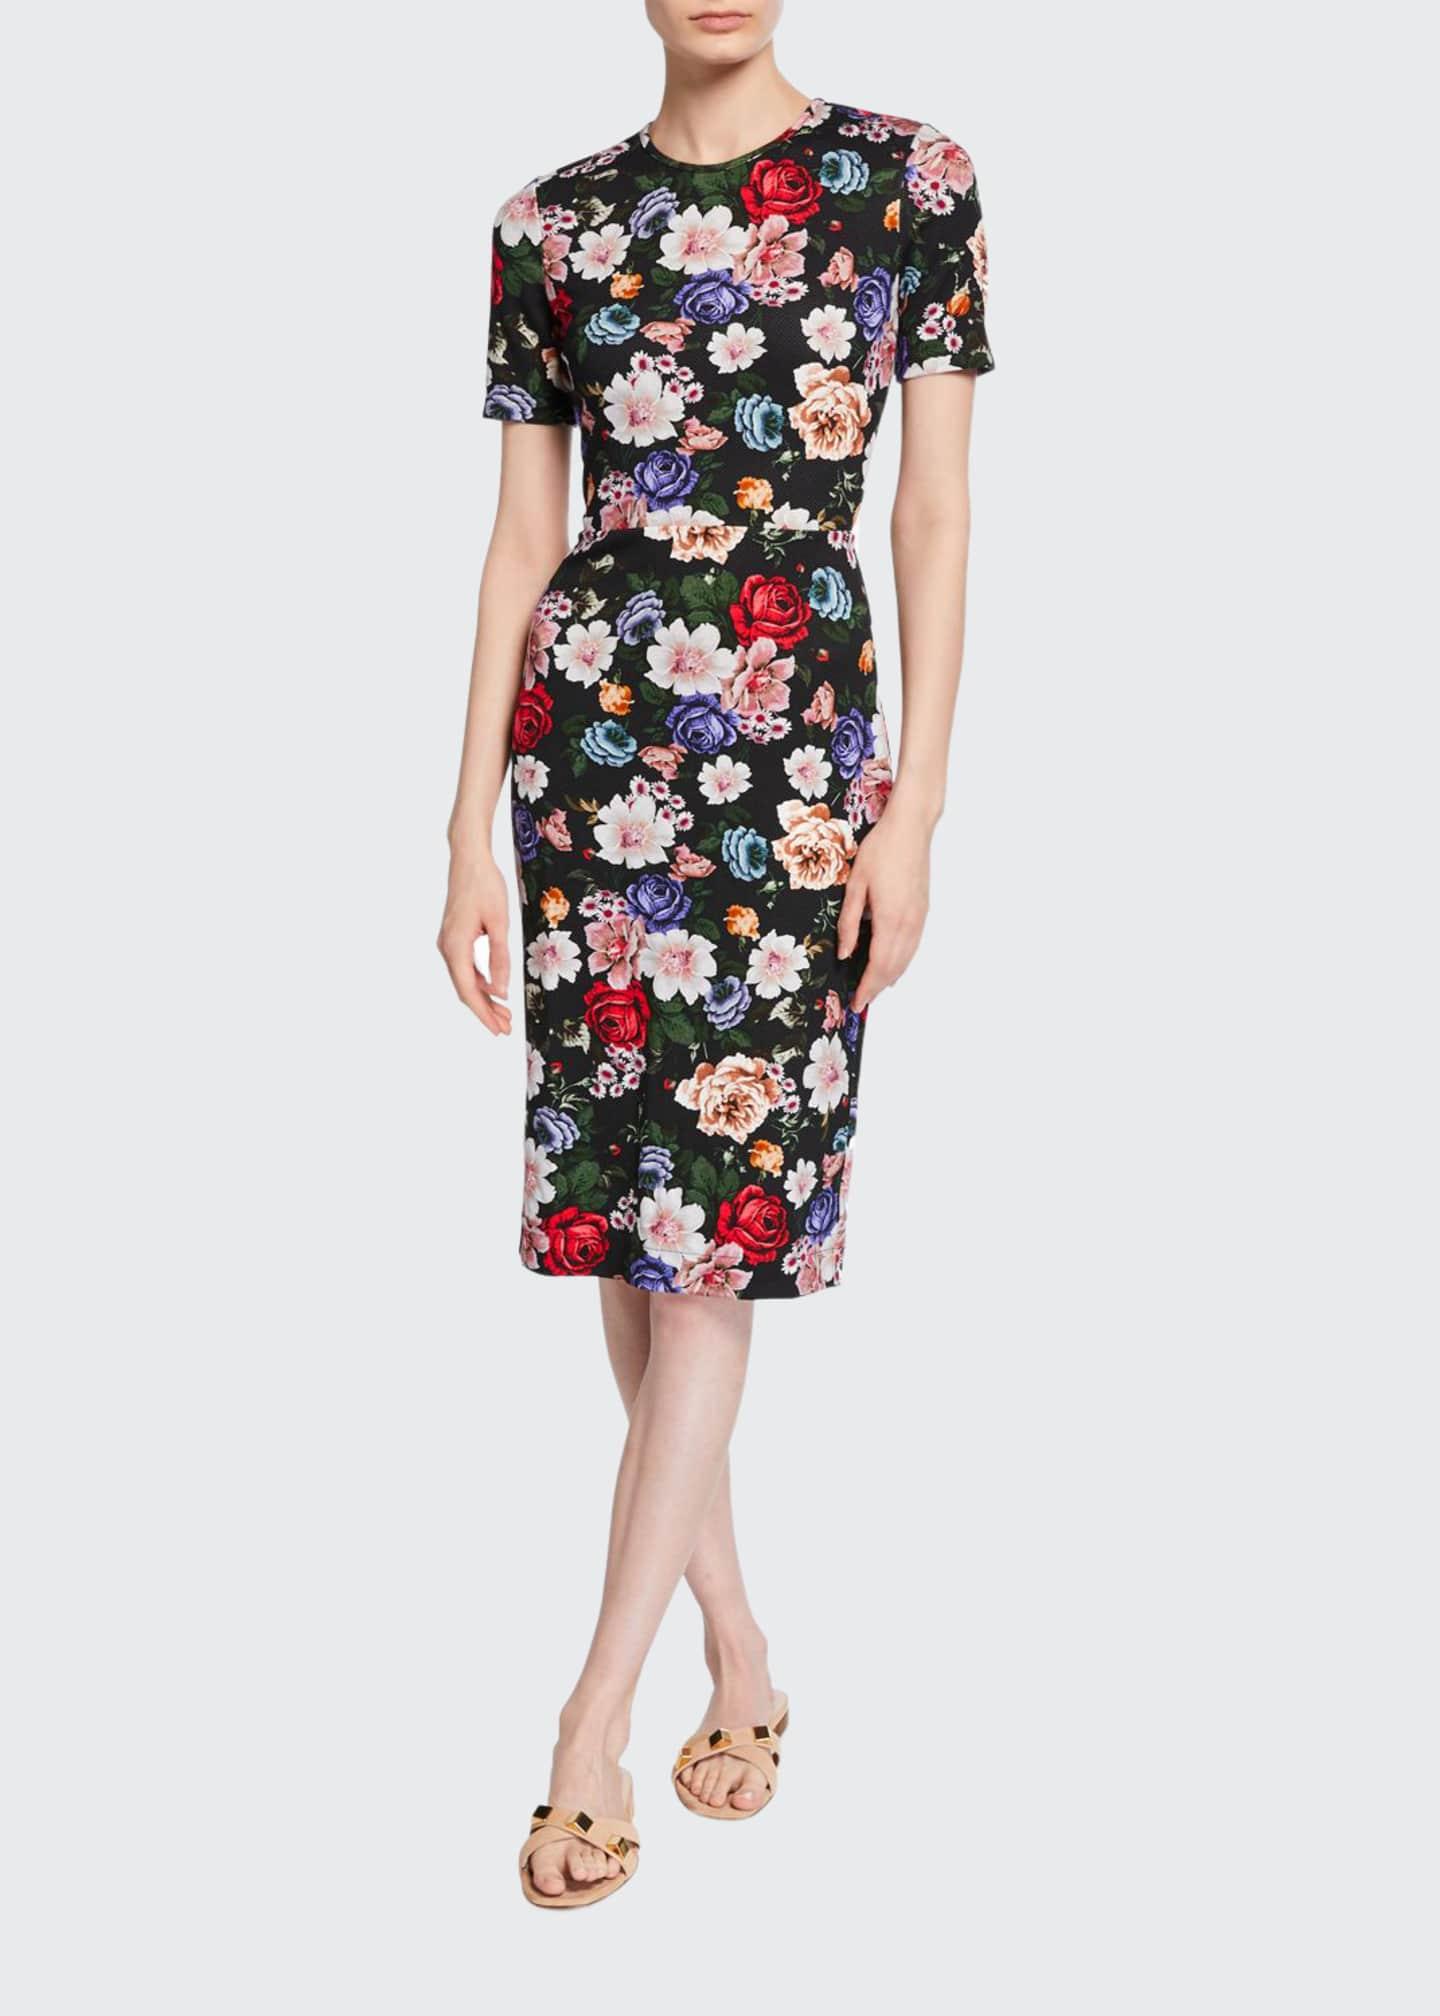 Erdem Essie Short-Sleeve Floral Sheath Dress